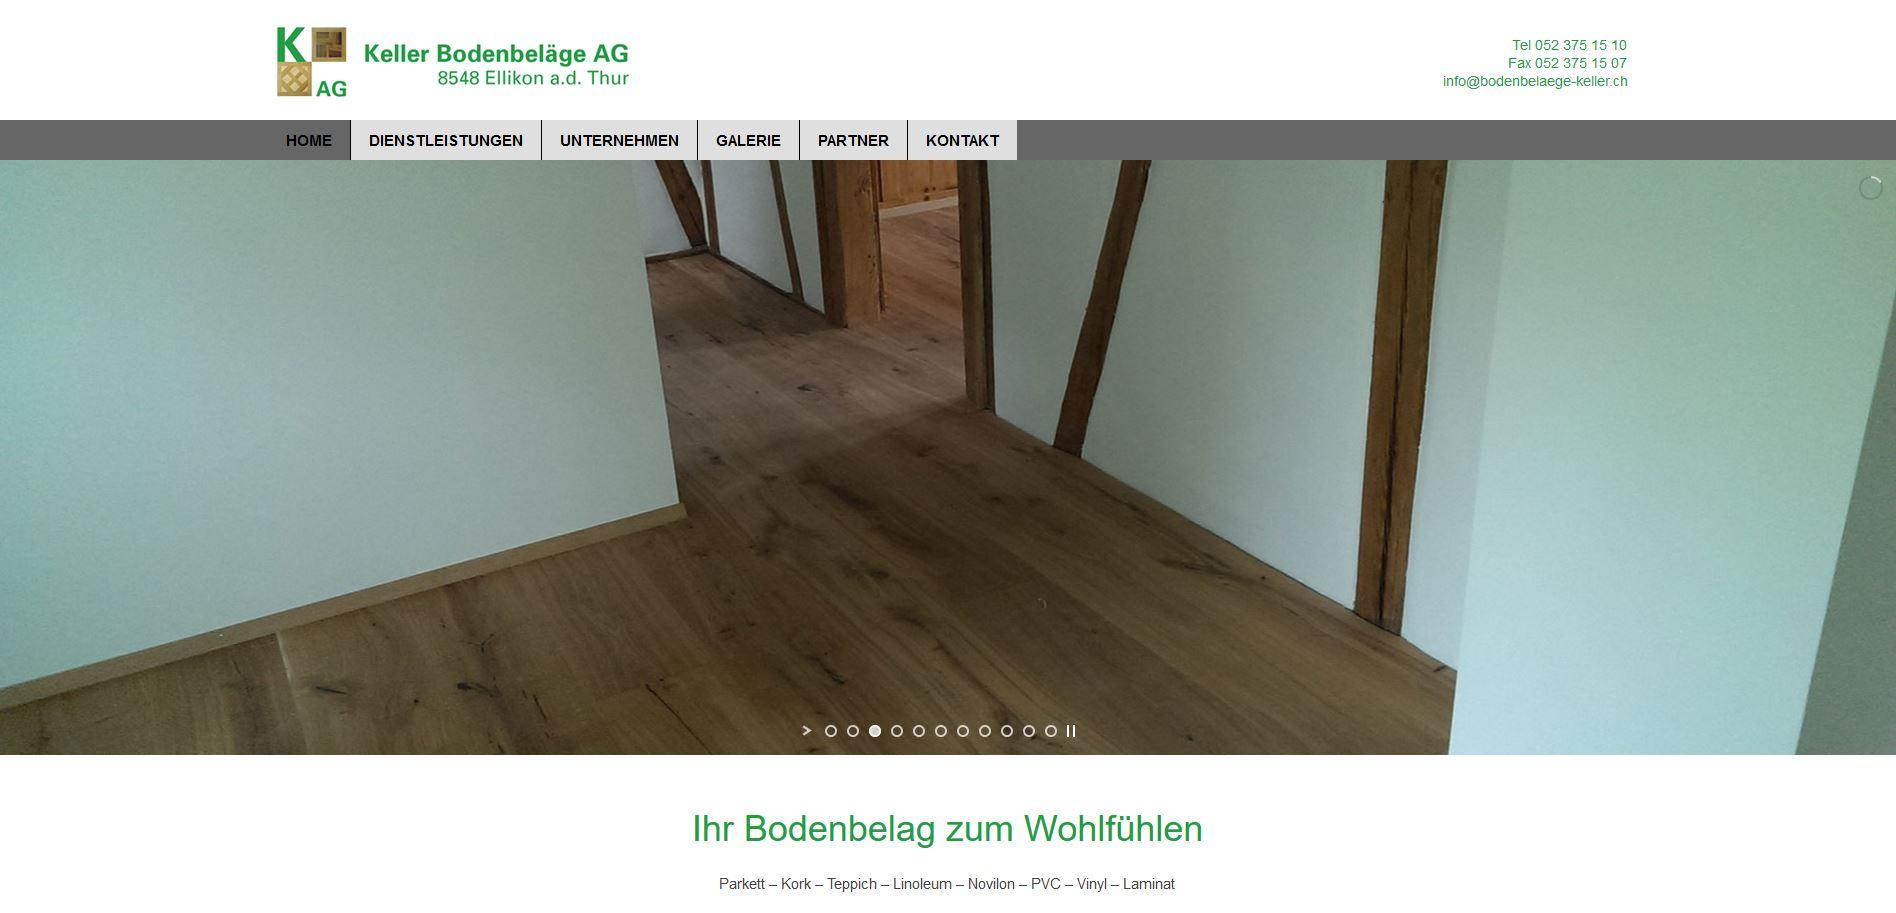 bodenbelaege-keller.ch